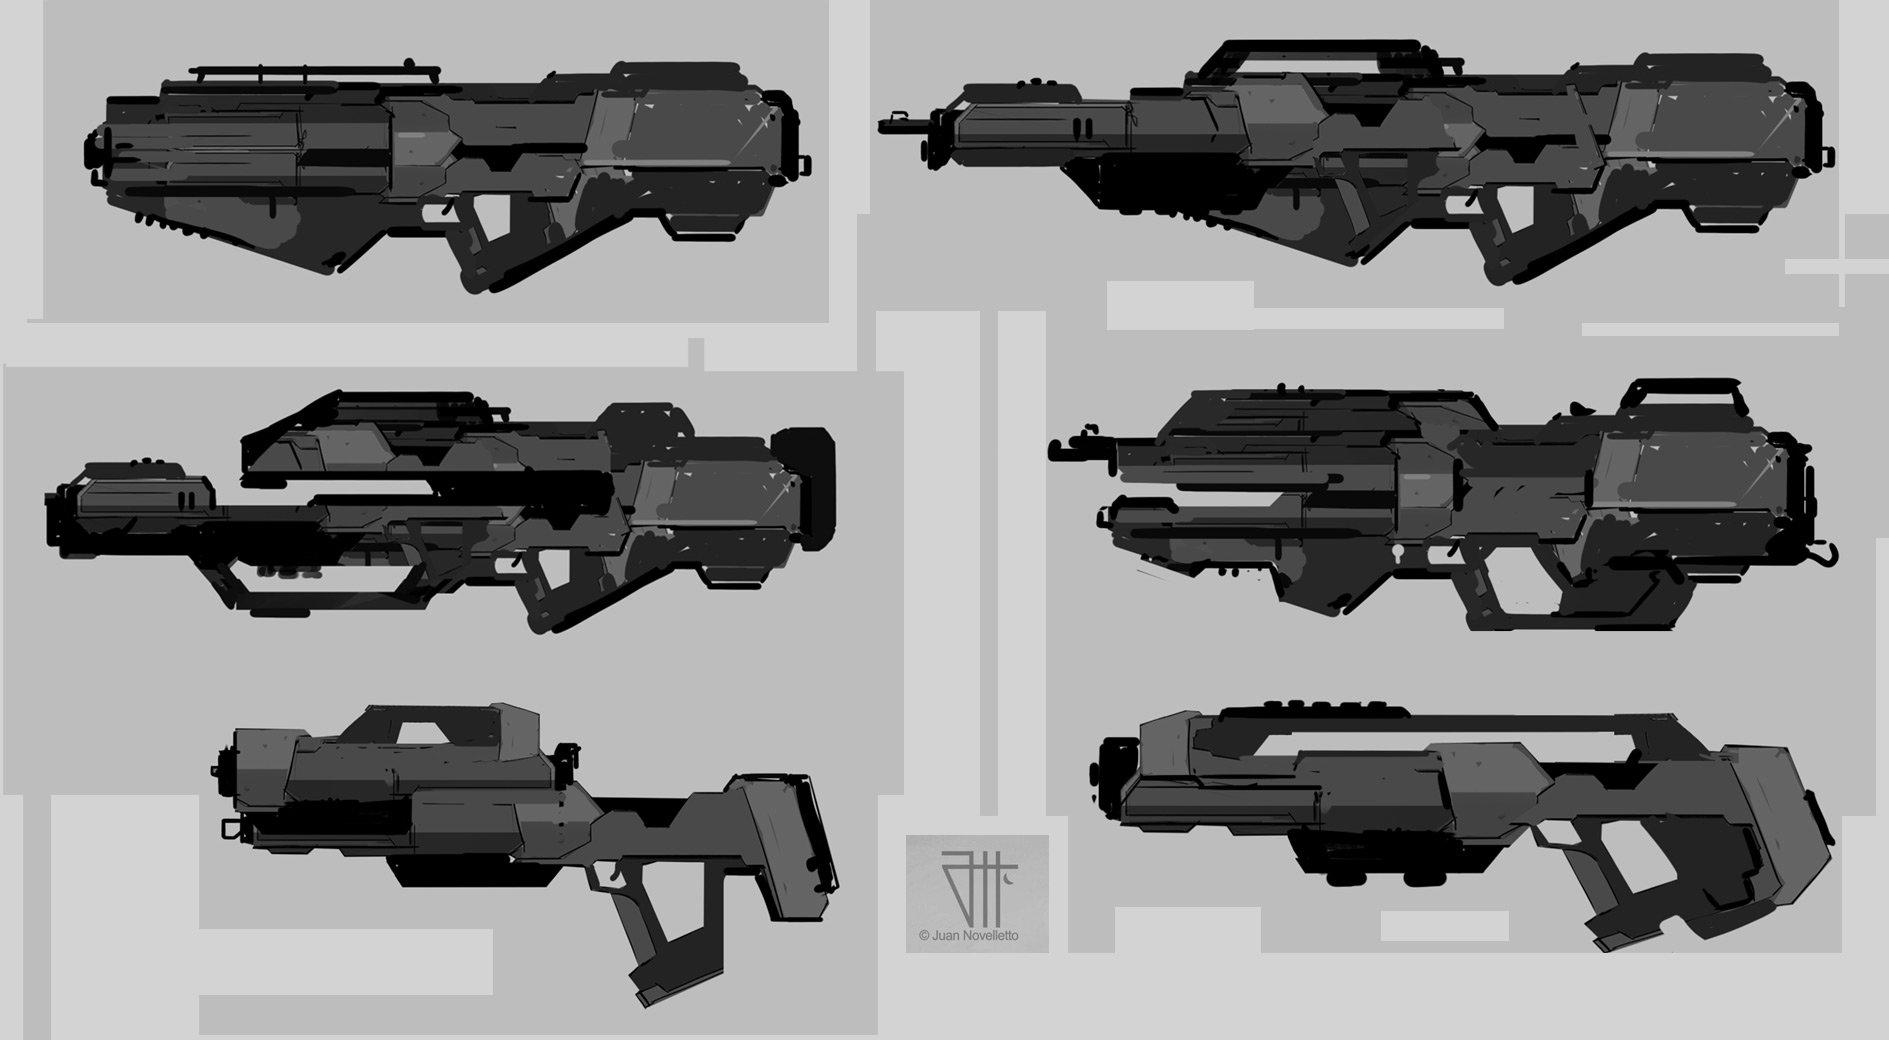 Juan novelletto weapon01 sketches